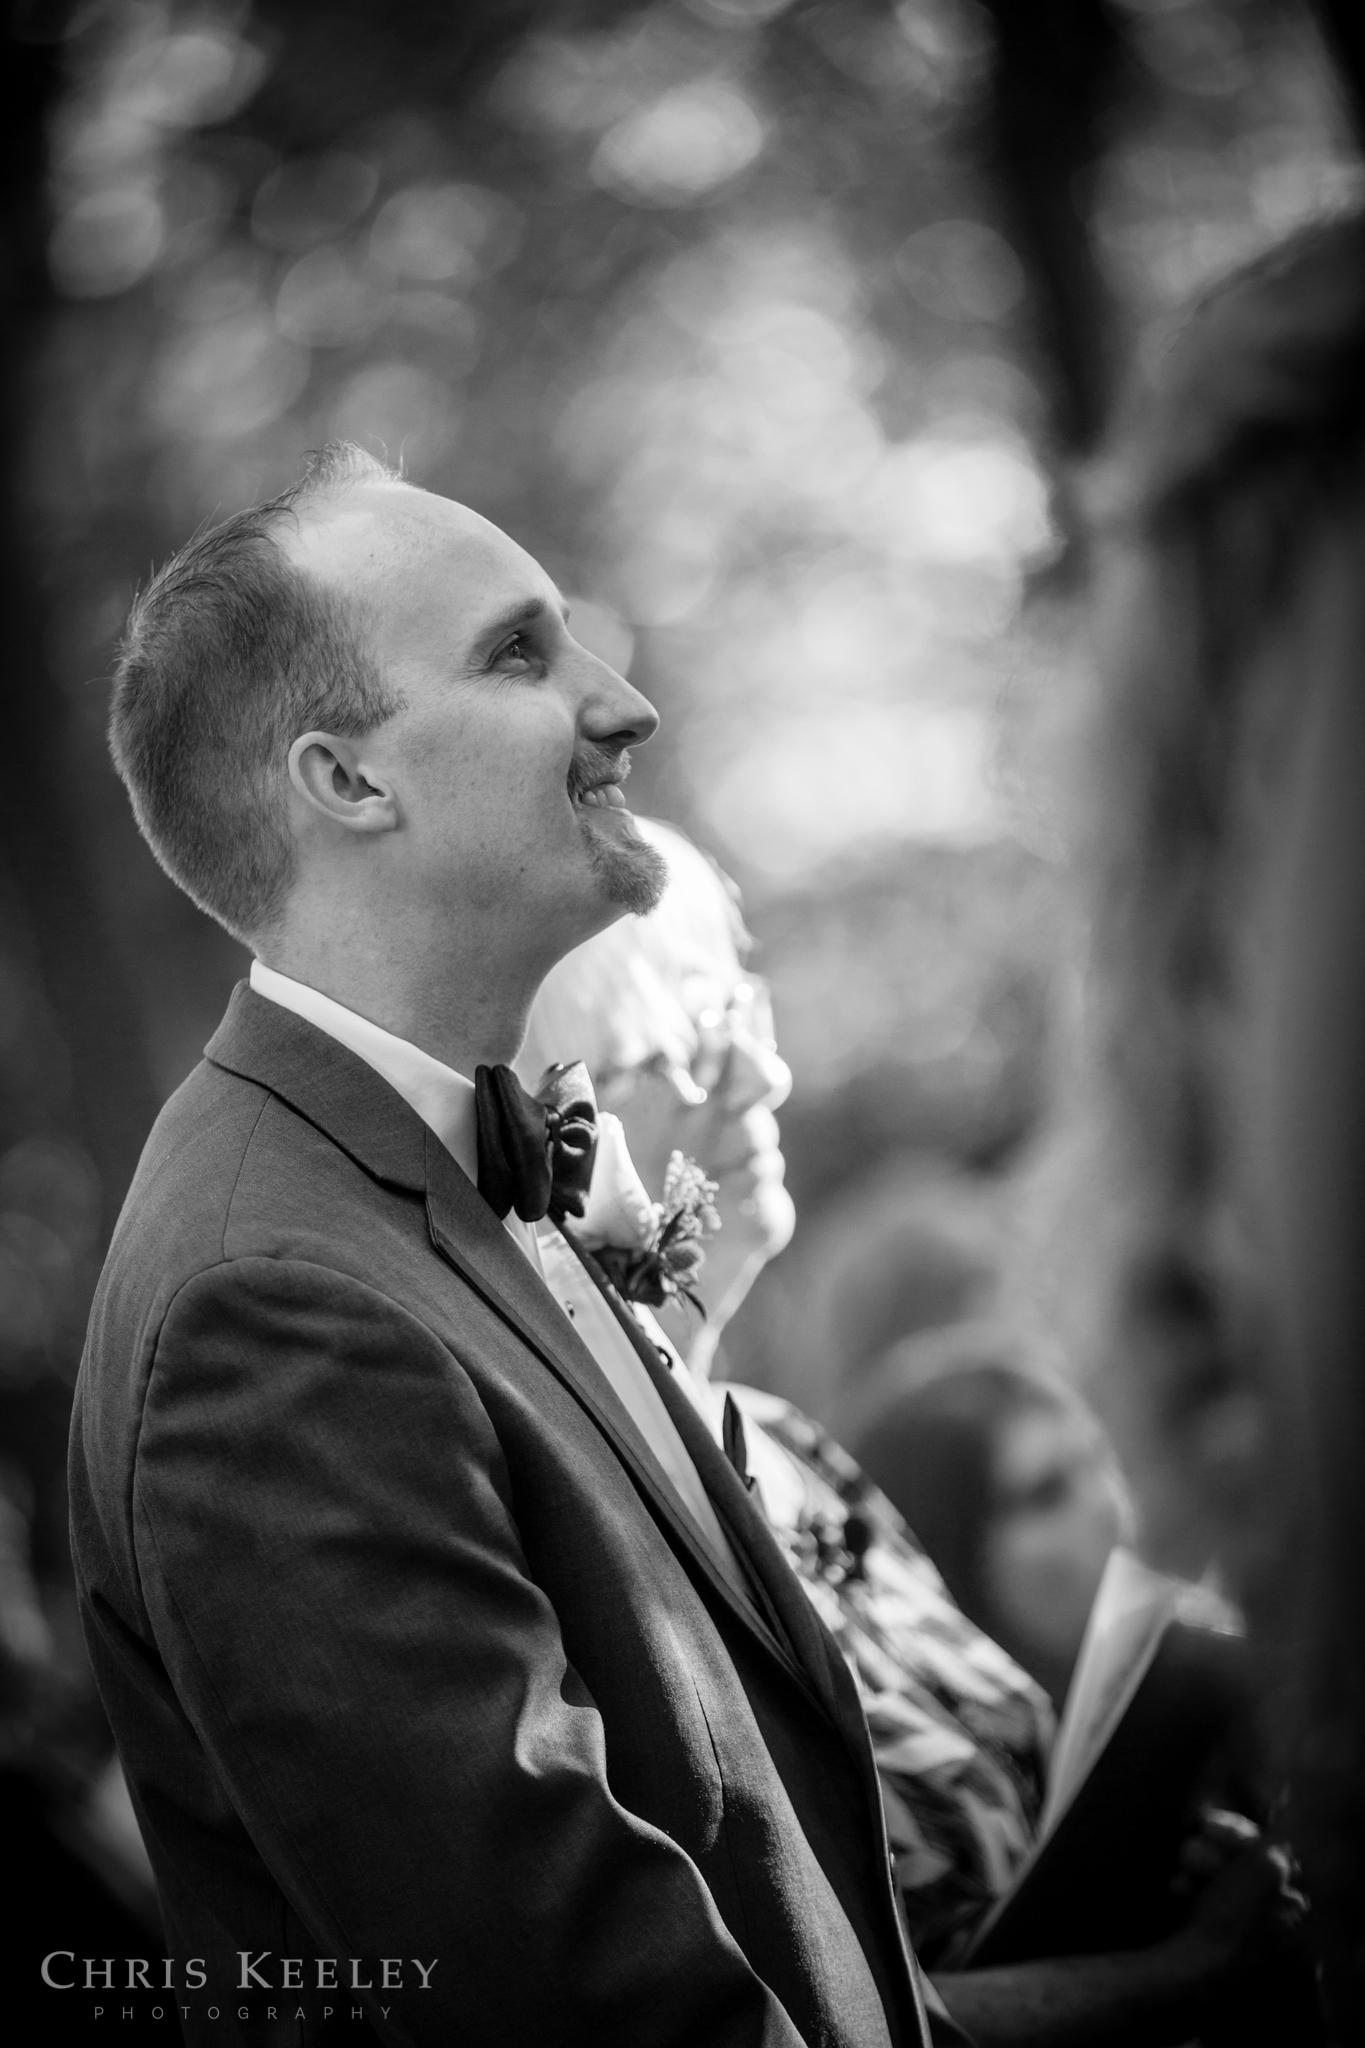 new-hampshire-wedding-photographer-three-chimneys-inn-chris-keeley-photography-11.jpg